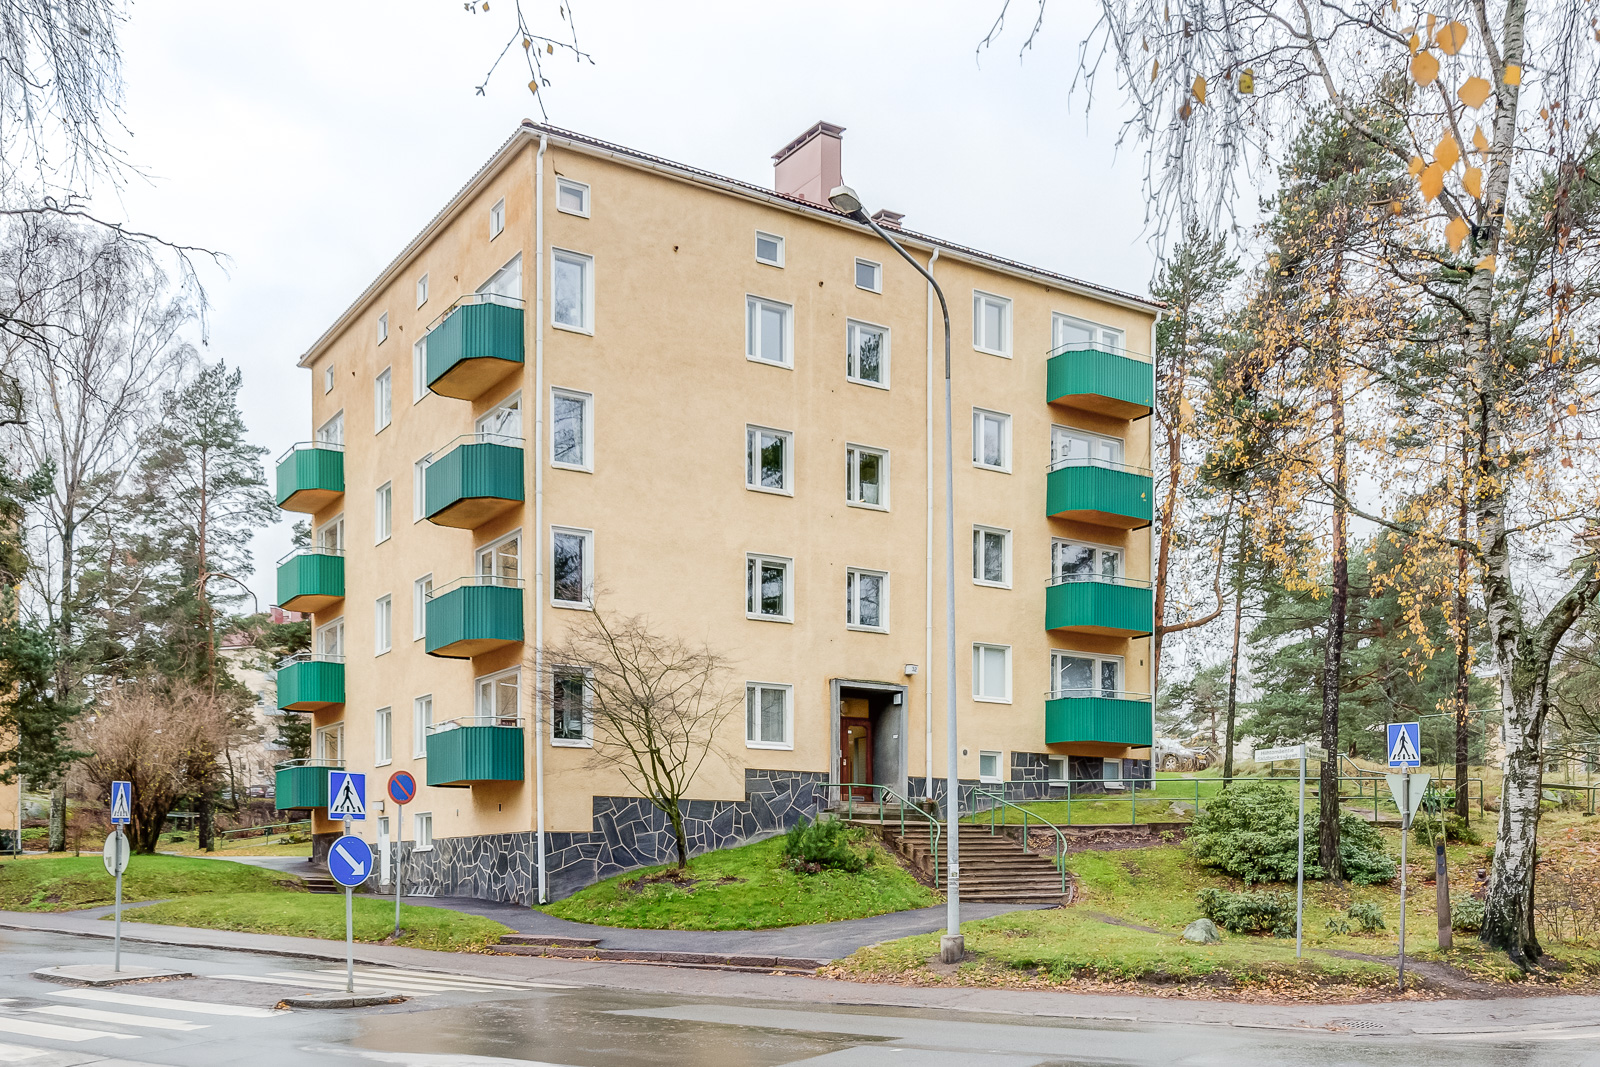 KT 3h Herttoniemi, Helsinki